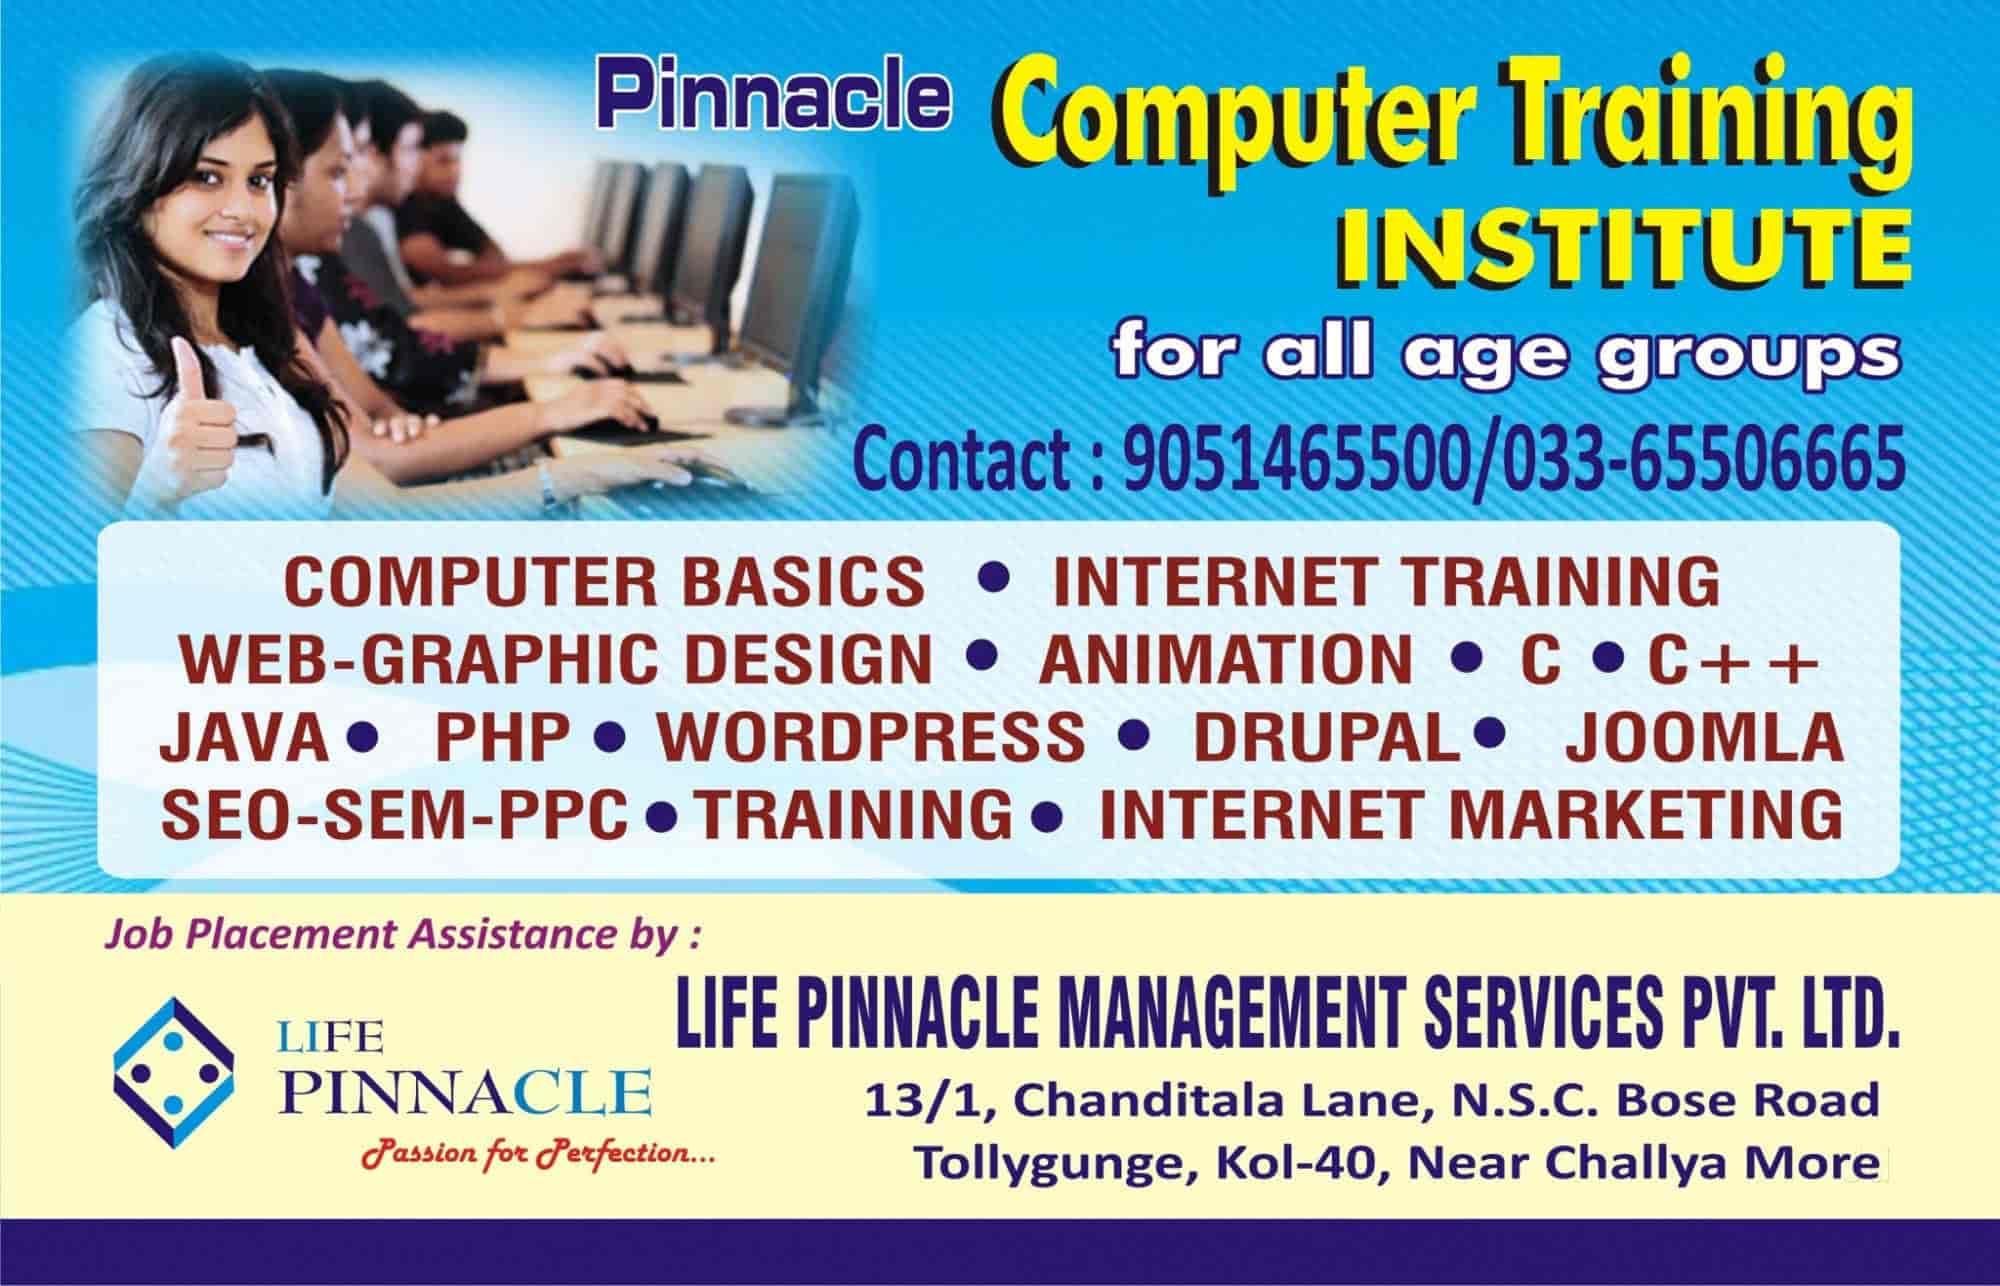 Pinnacle Computer Training Institute Photos Regent Park Kolkata Pictures Images Gallery